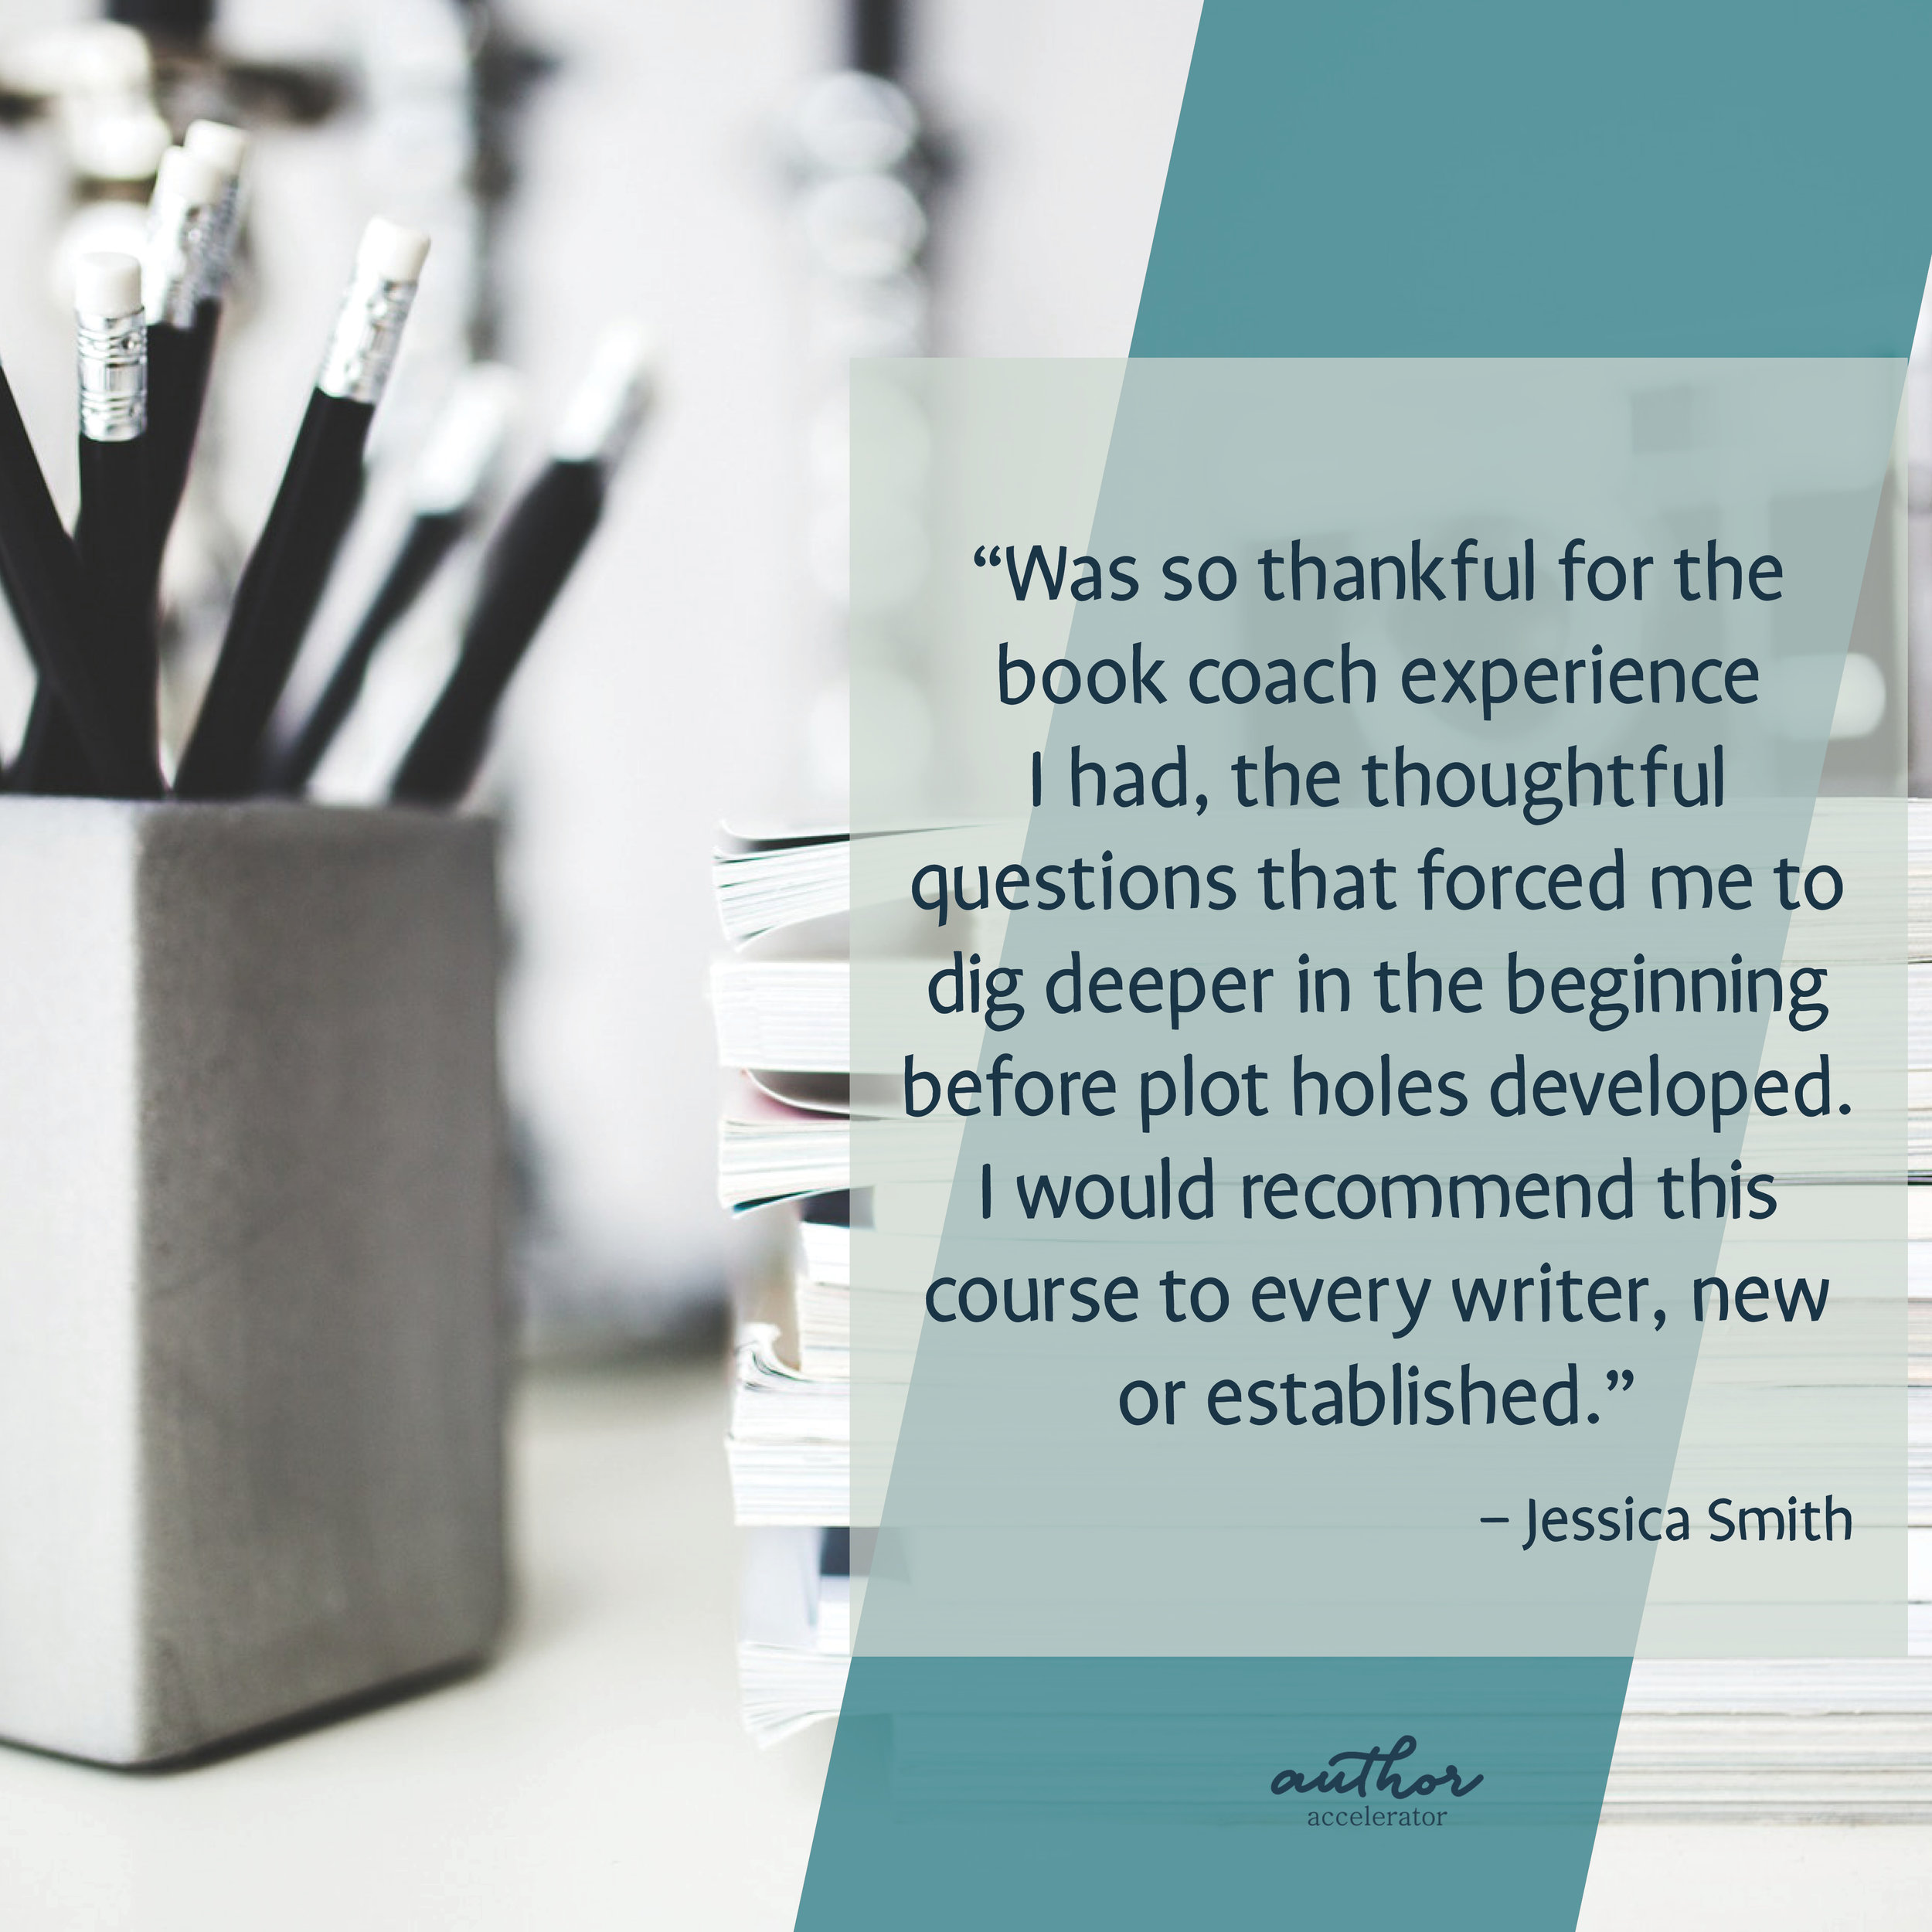 book_coaching_jessica_smith.jpg